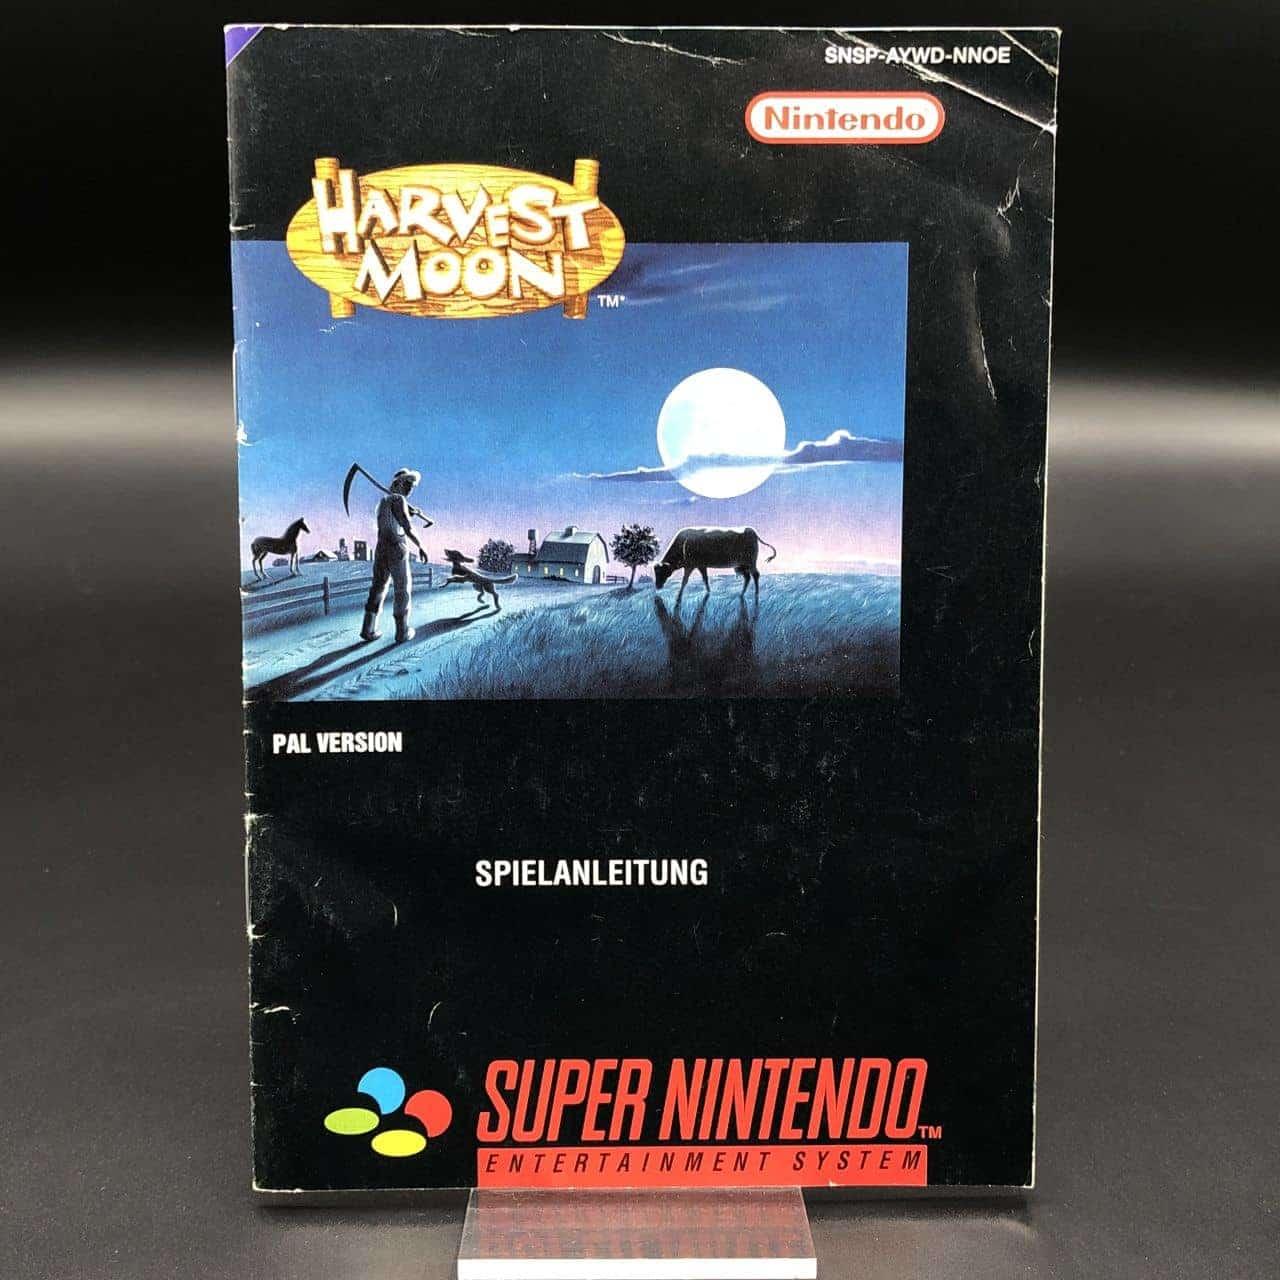 SNES Harvest Moon (Komplett) (Gebrauchsspuren) Super Nintendo